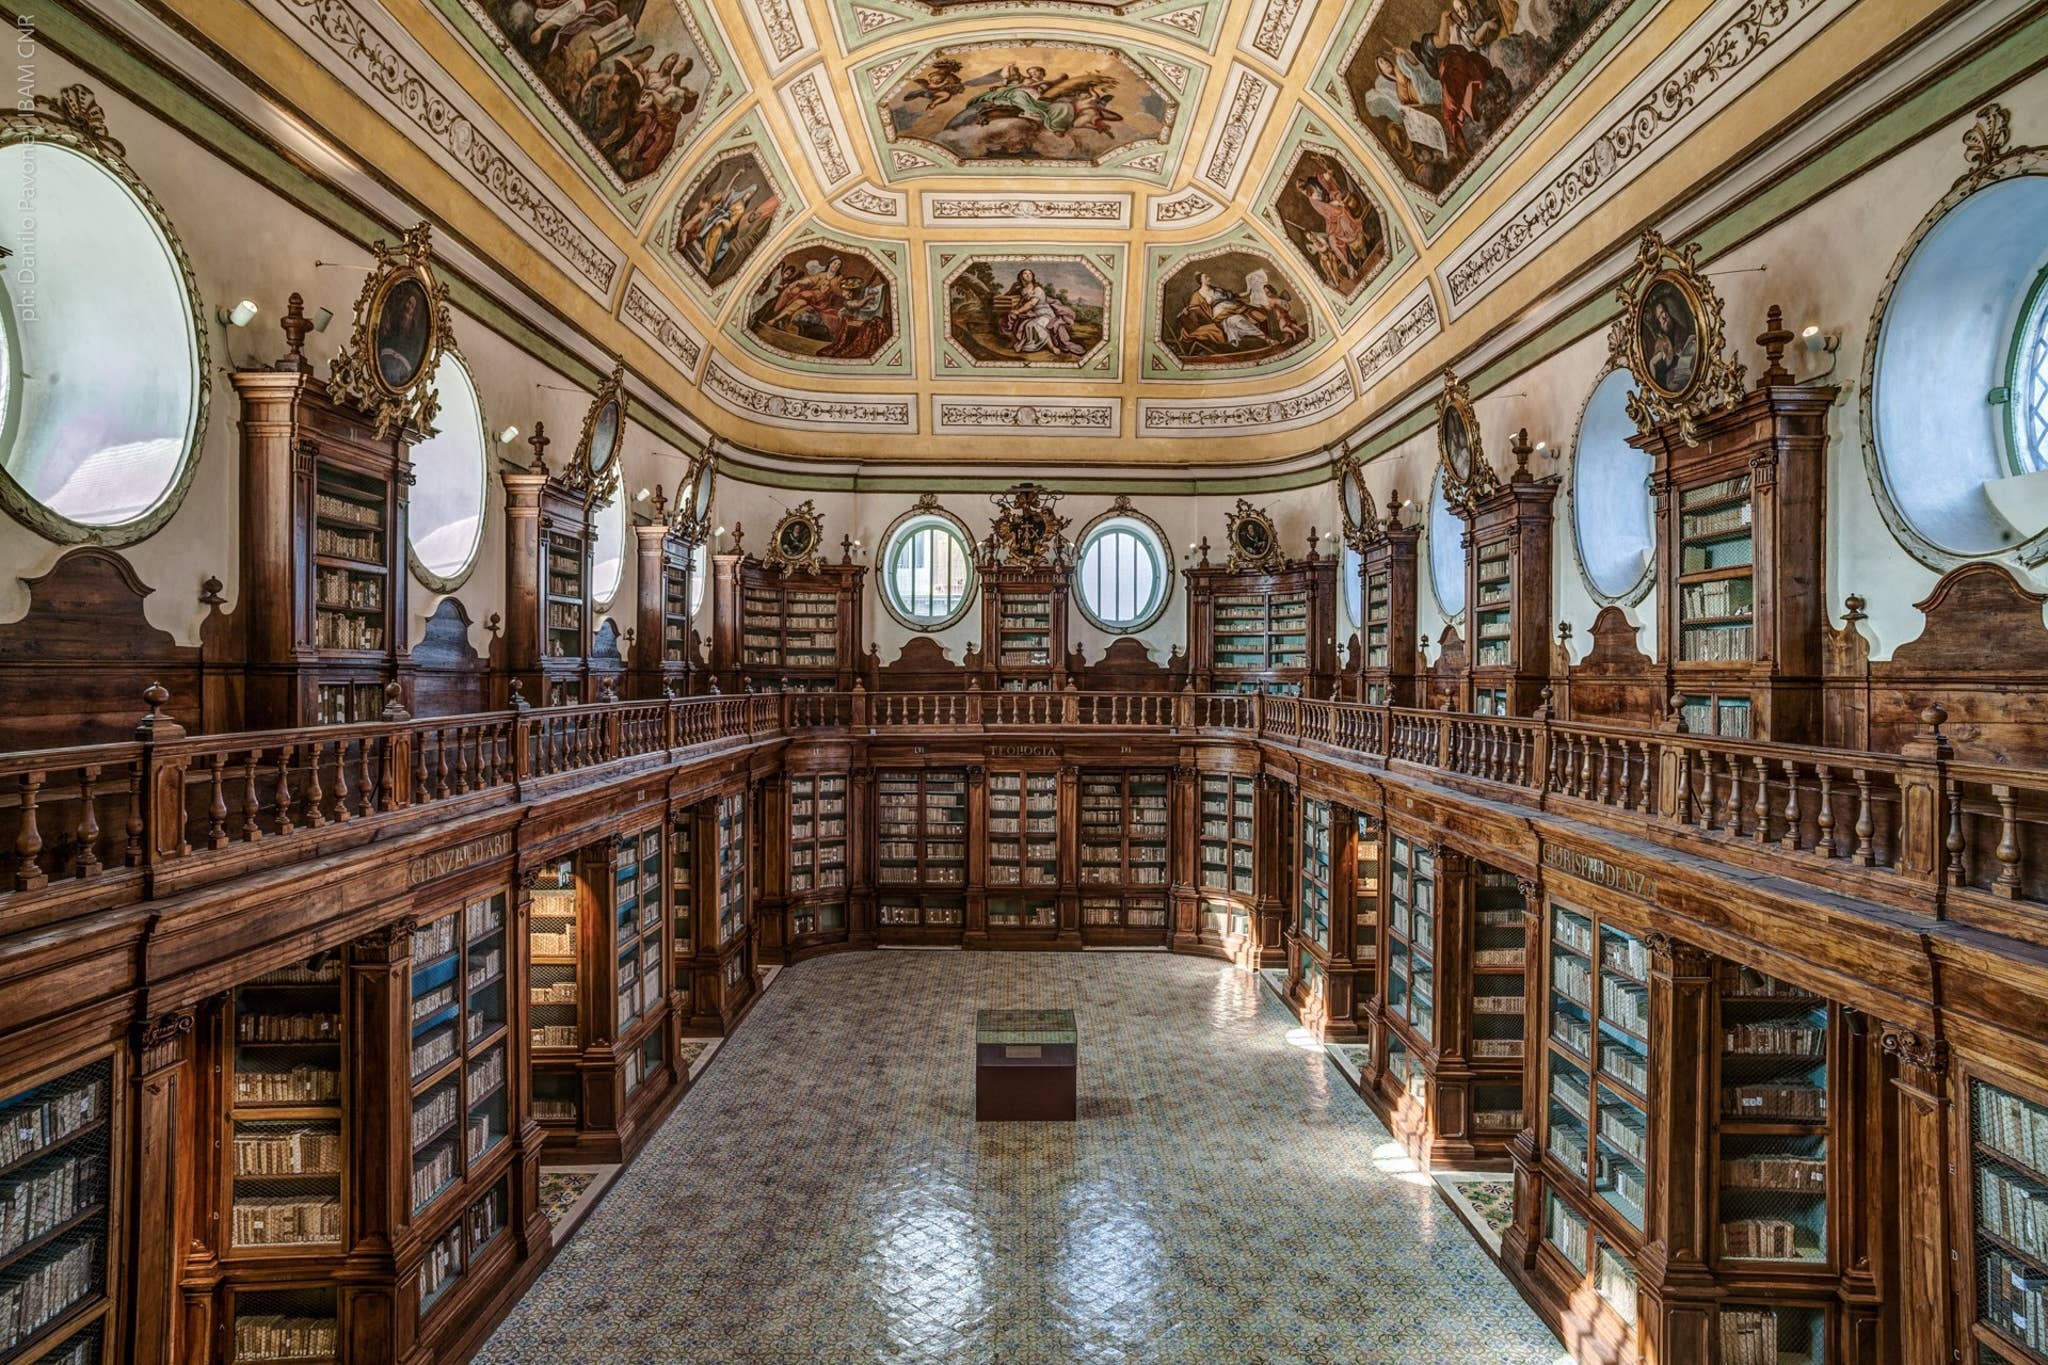 Maison de vacances  (2782175), Catania, Catania, Sicile, Italie, image 40